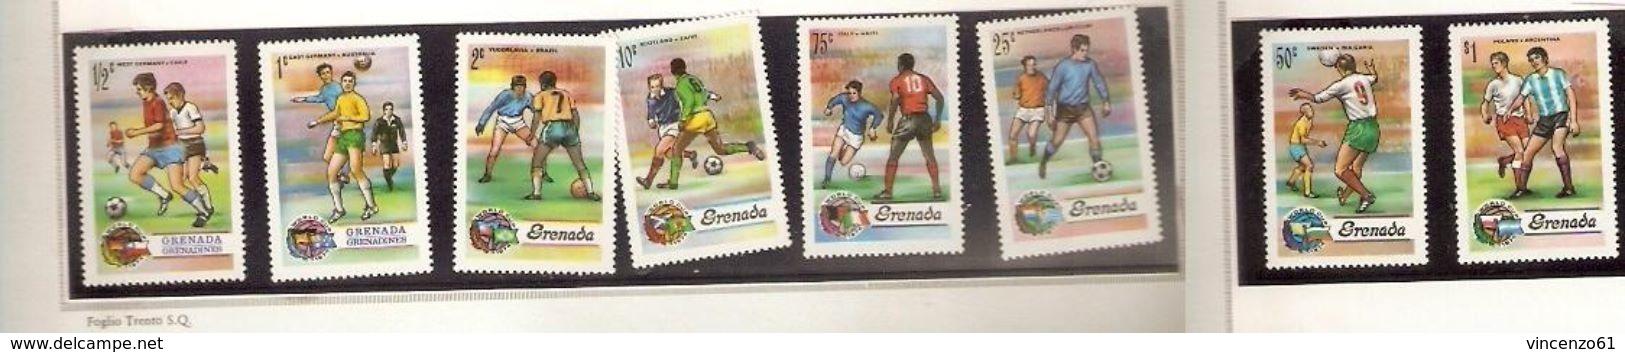 BERMUDA FIFA WORLD CUP 1974 GERMANY 1974 - Coppa Del Mondo